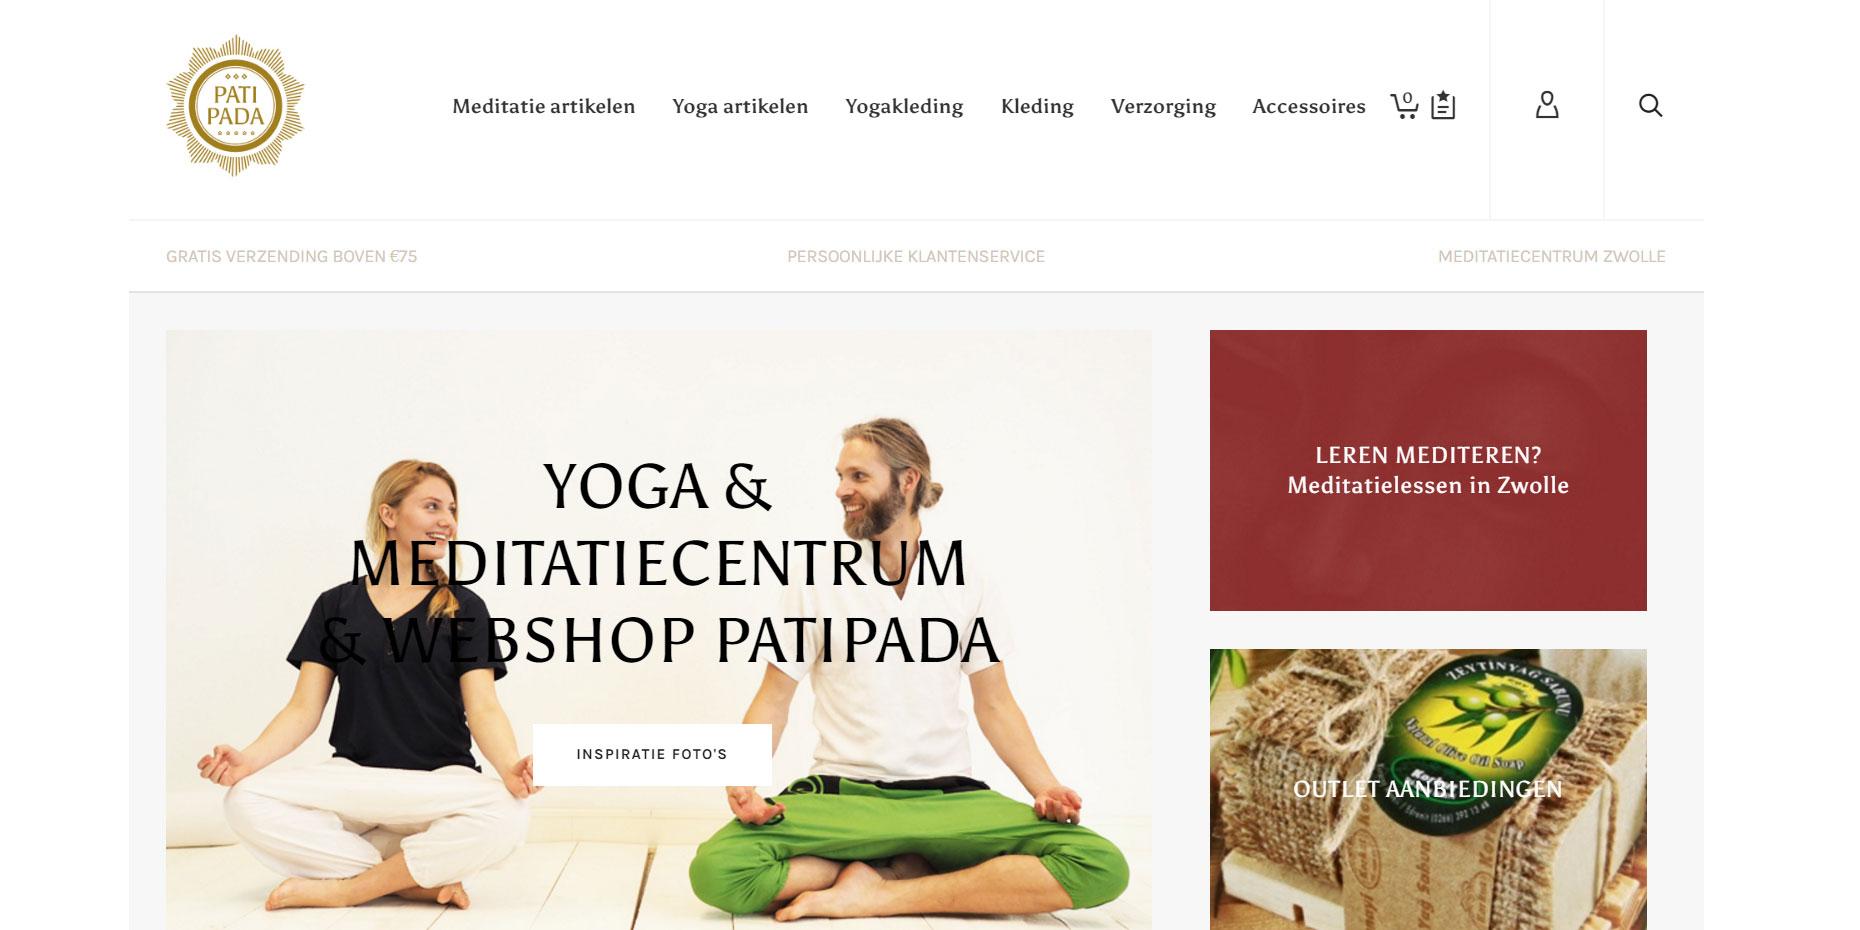 webdesign patipada meditatie